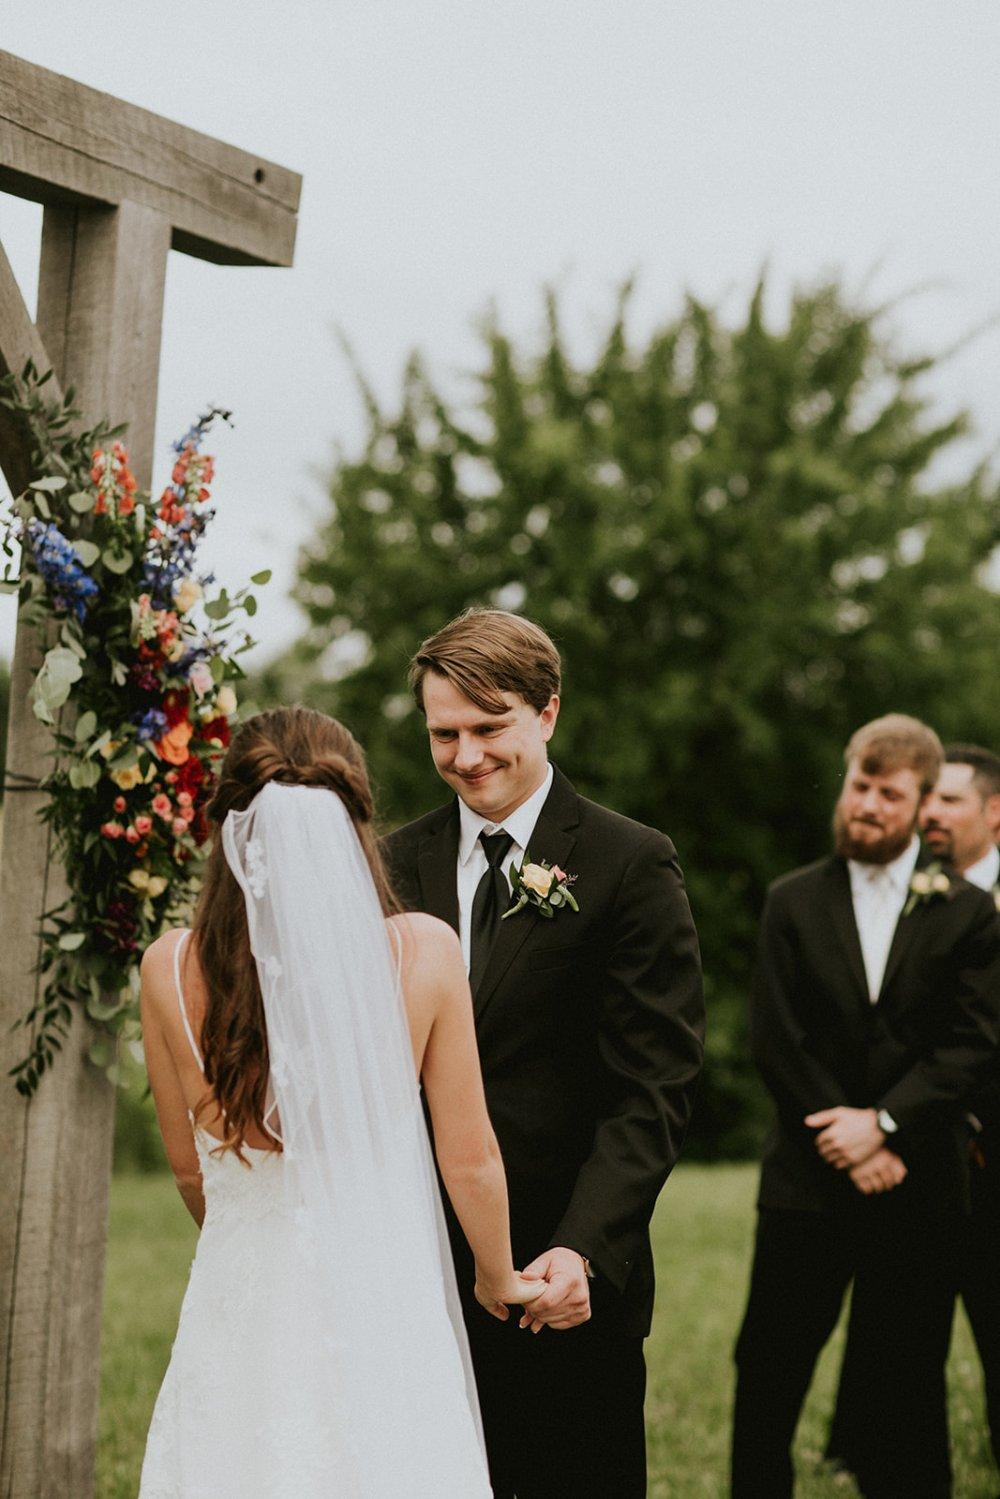 Calan-Adam-WEDDING-JUNE-2019-109 2.jpg